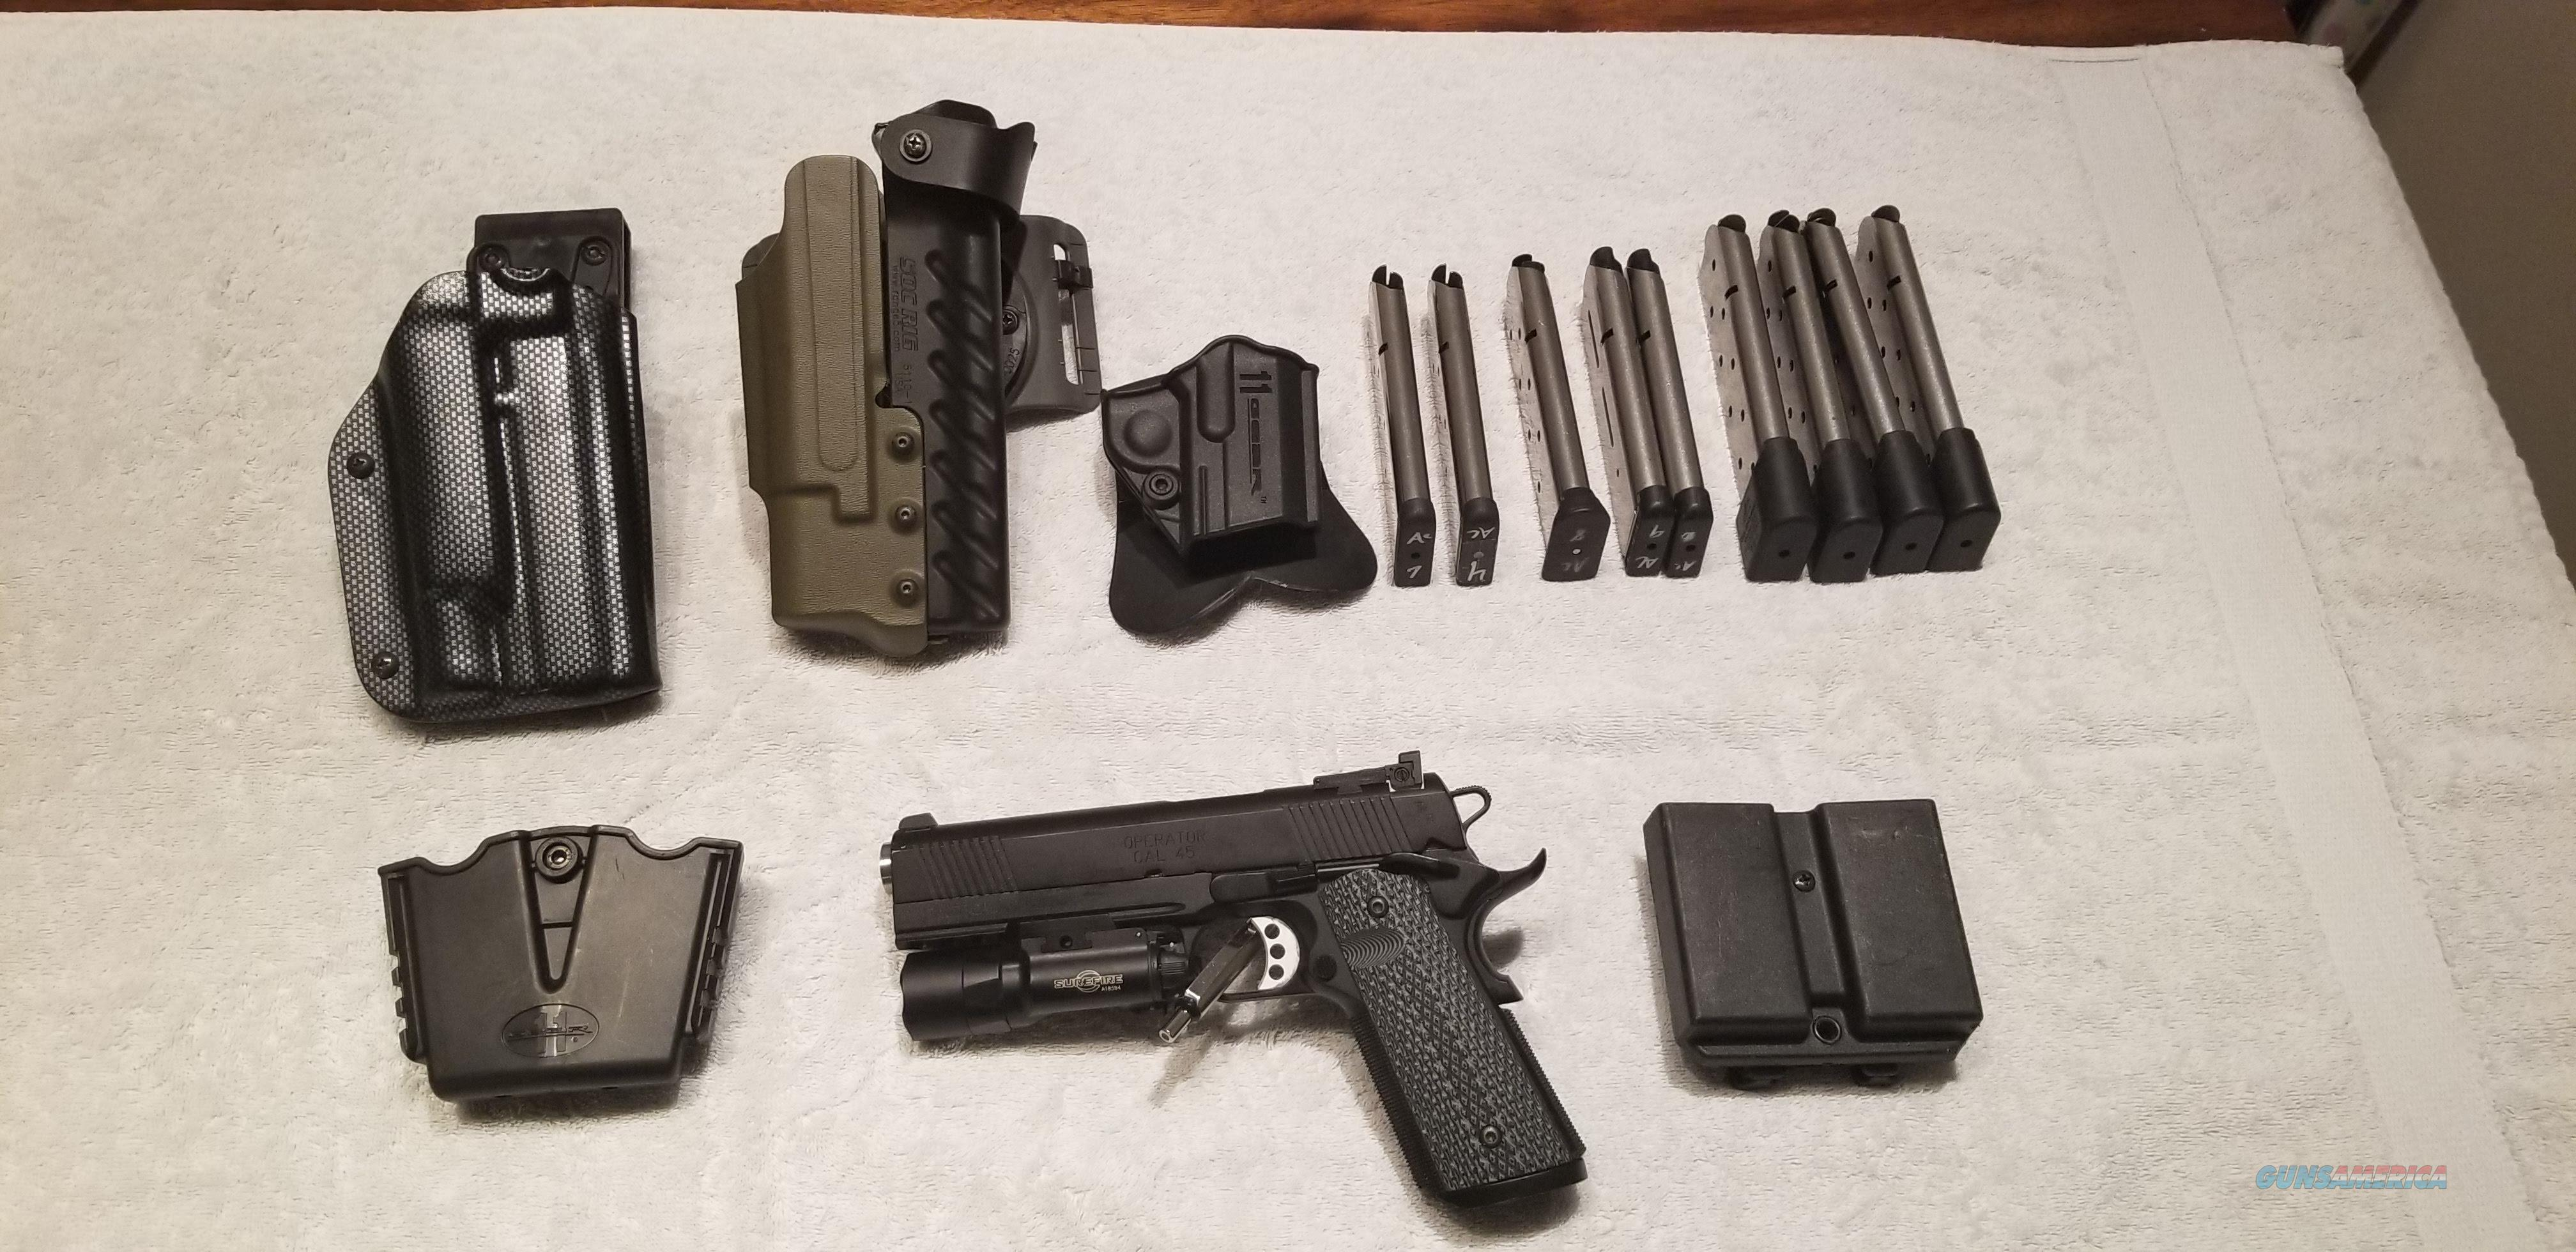 TRP Operator- SureFire x300 - 3 Holsters - 7 Mags  Guns > Pistols > Springfield Armory Pistols > 1911 Type